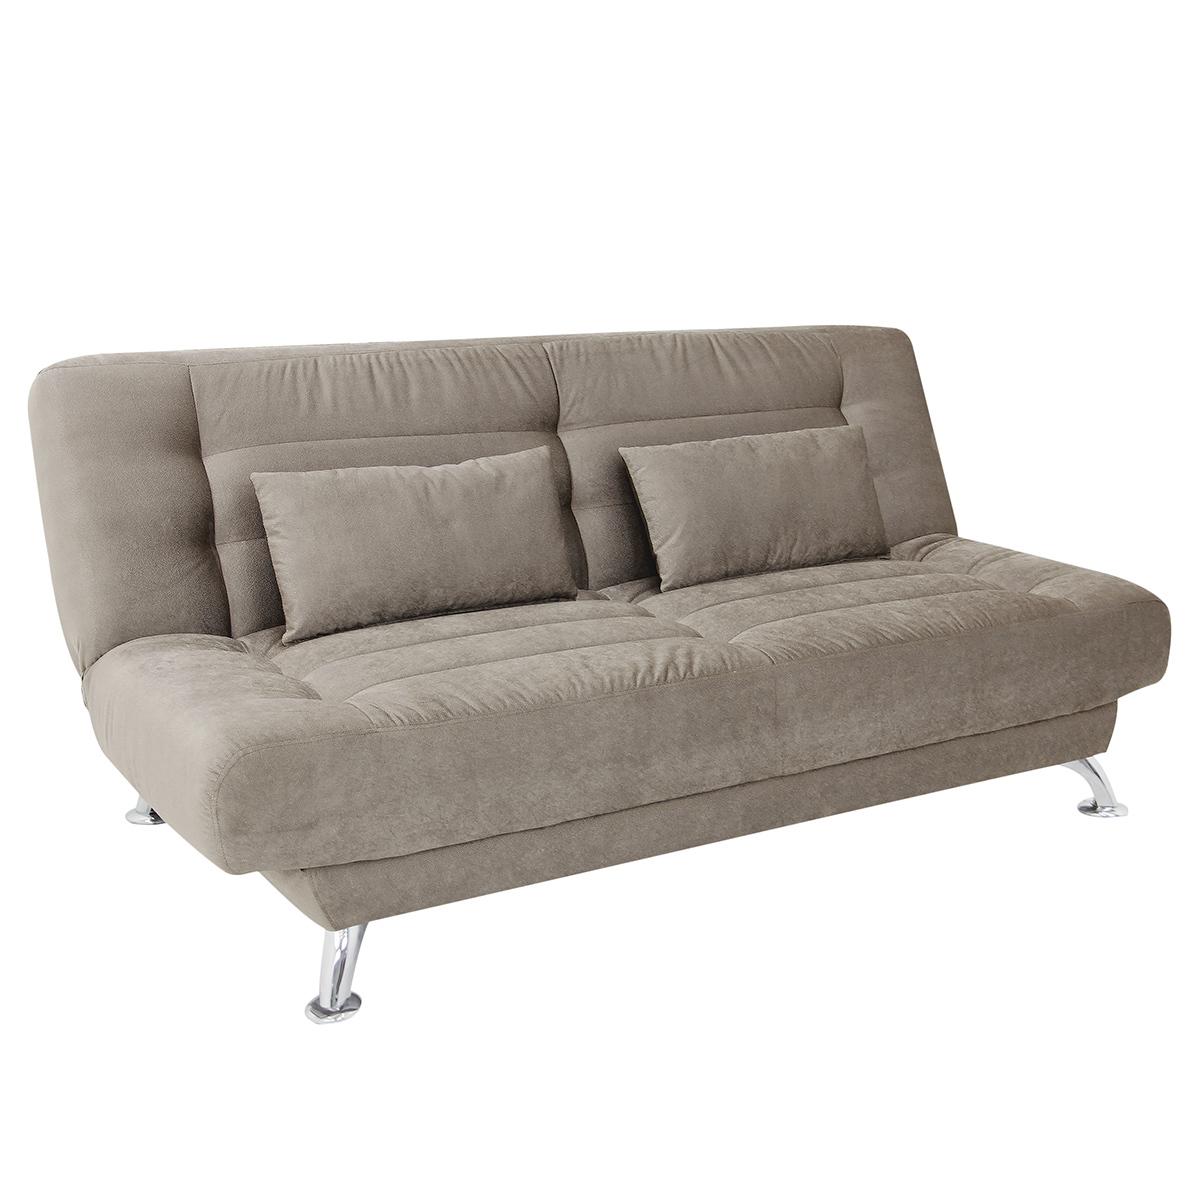 sofa cama carrefour dakar single seater malaysia sofá reclinável 3 lugares suede clean paola linoforte